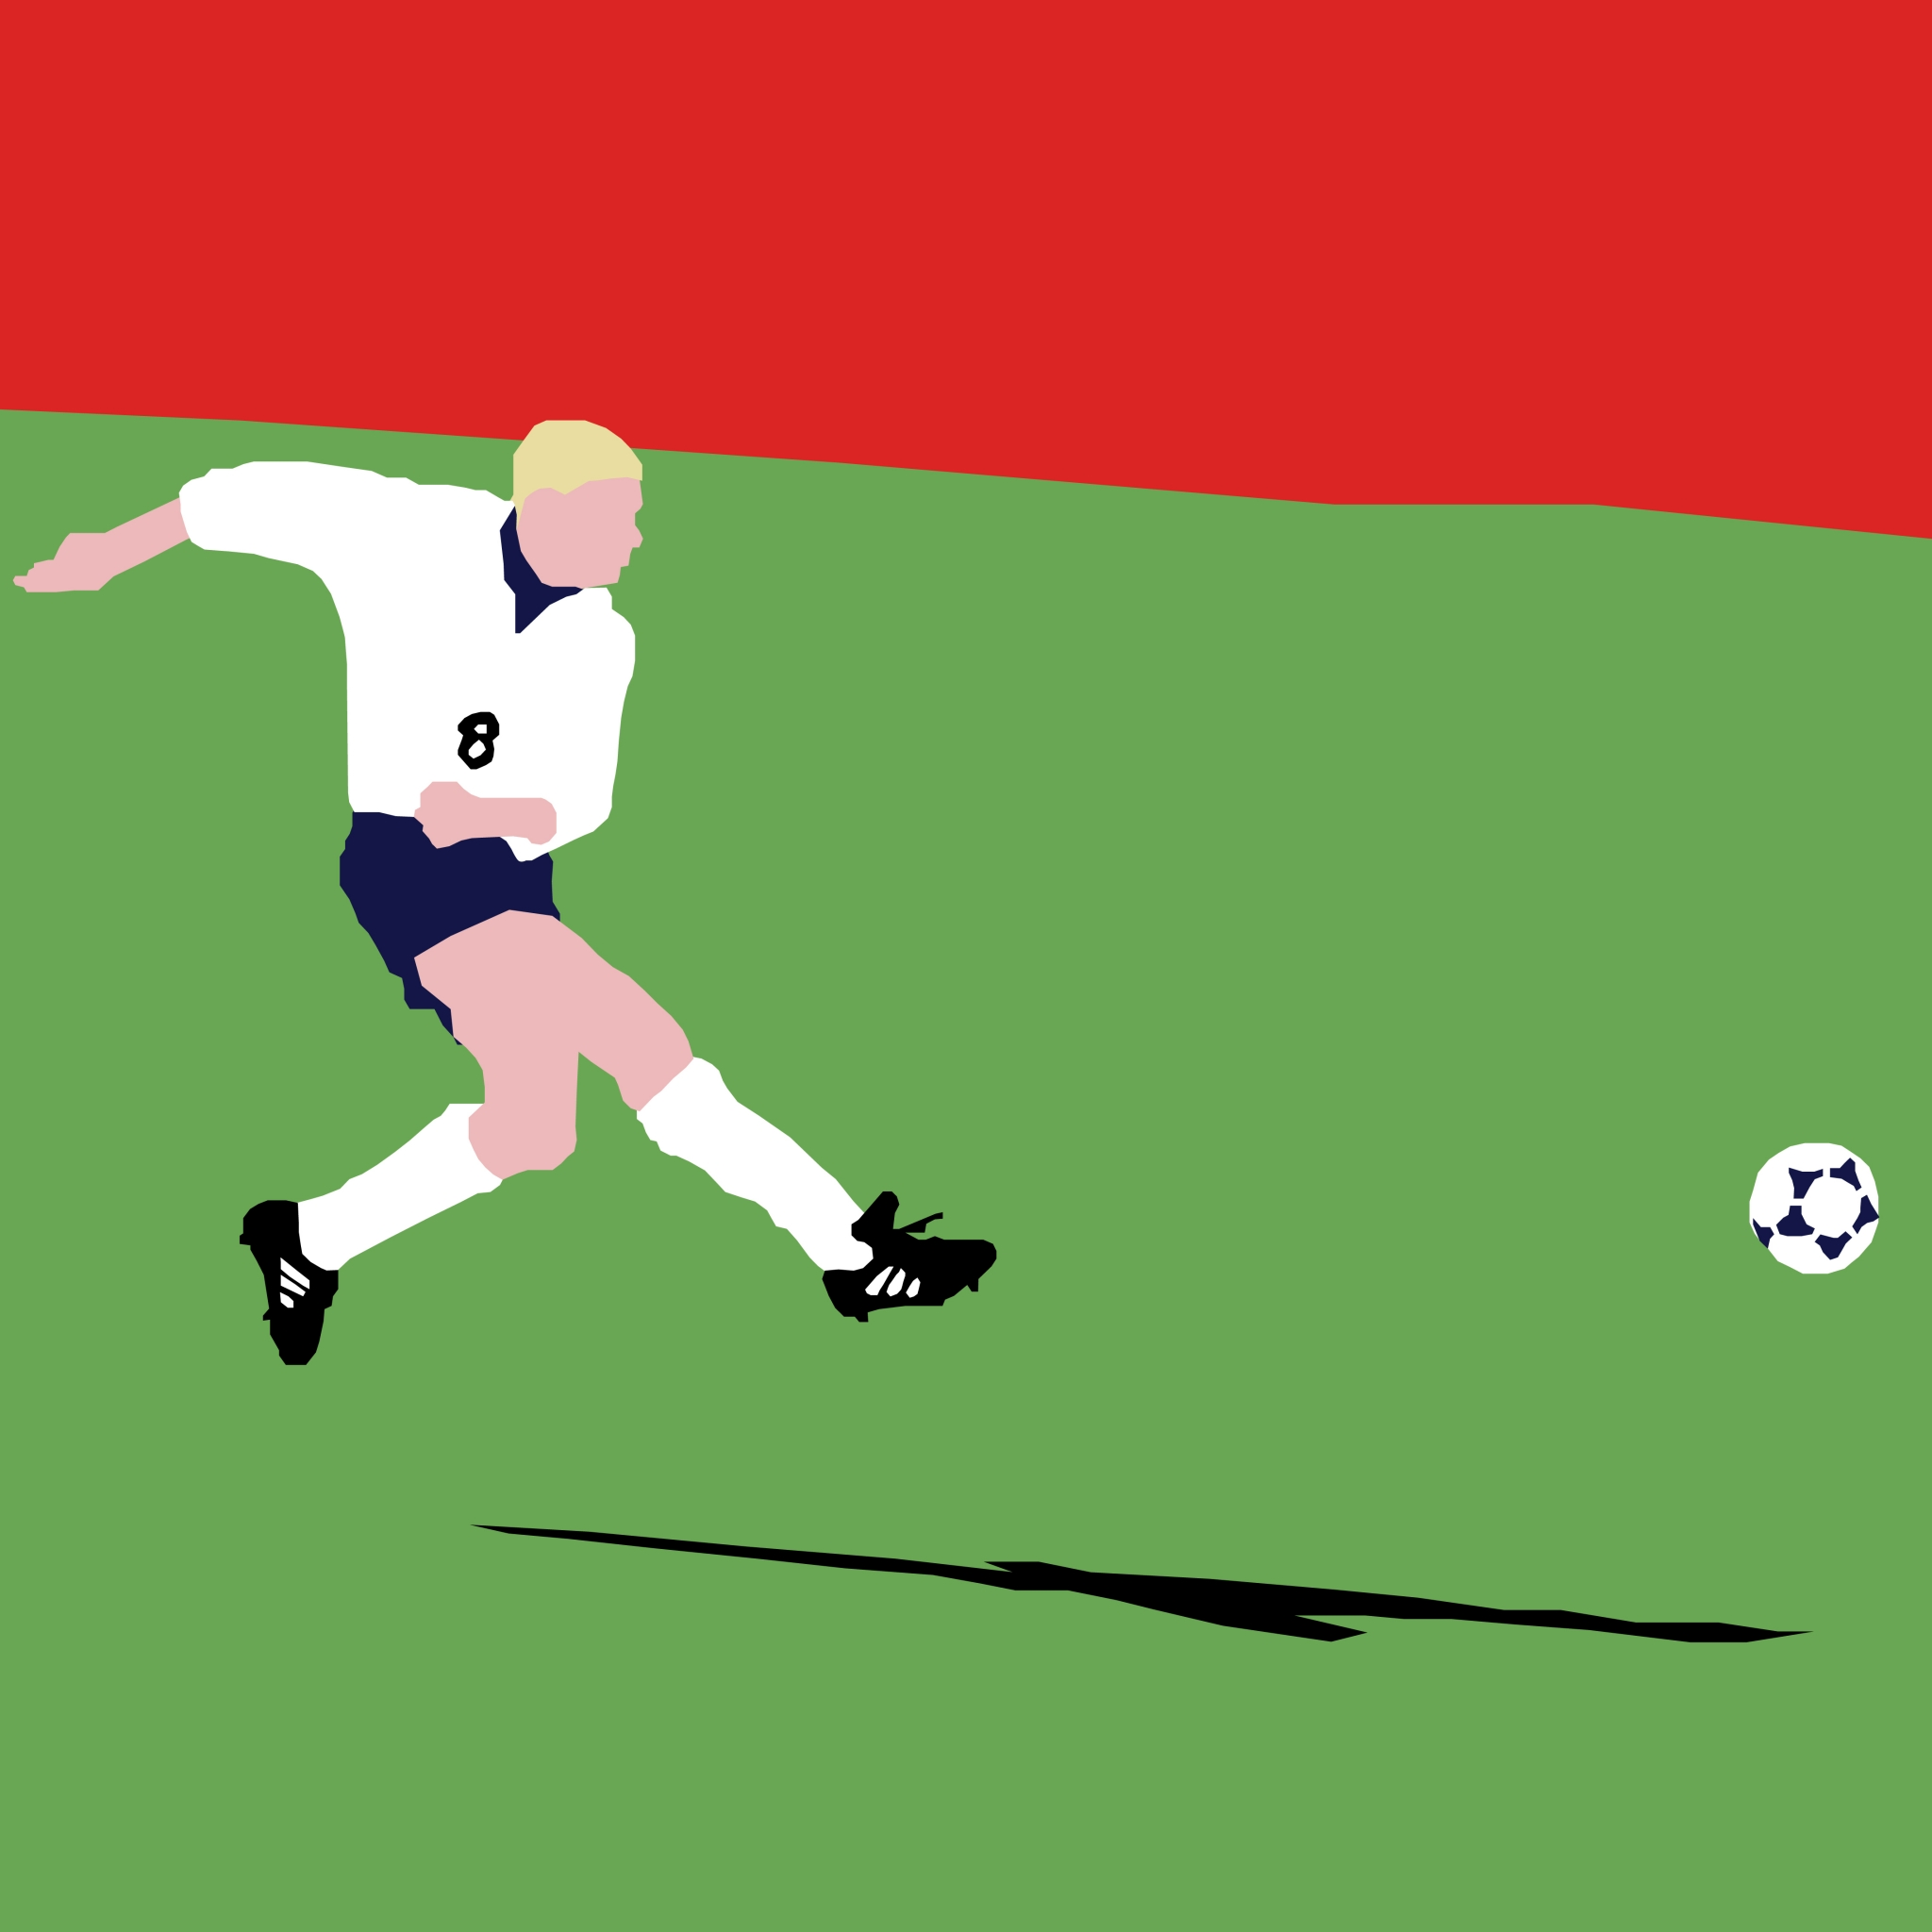 Illustration of Paul Gascoigne for England in 1996